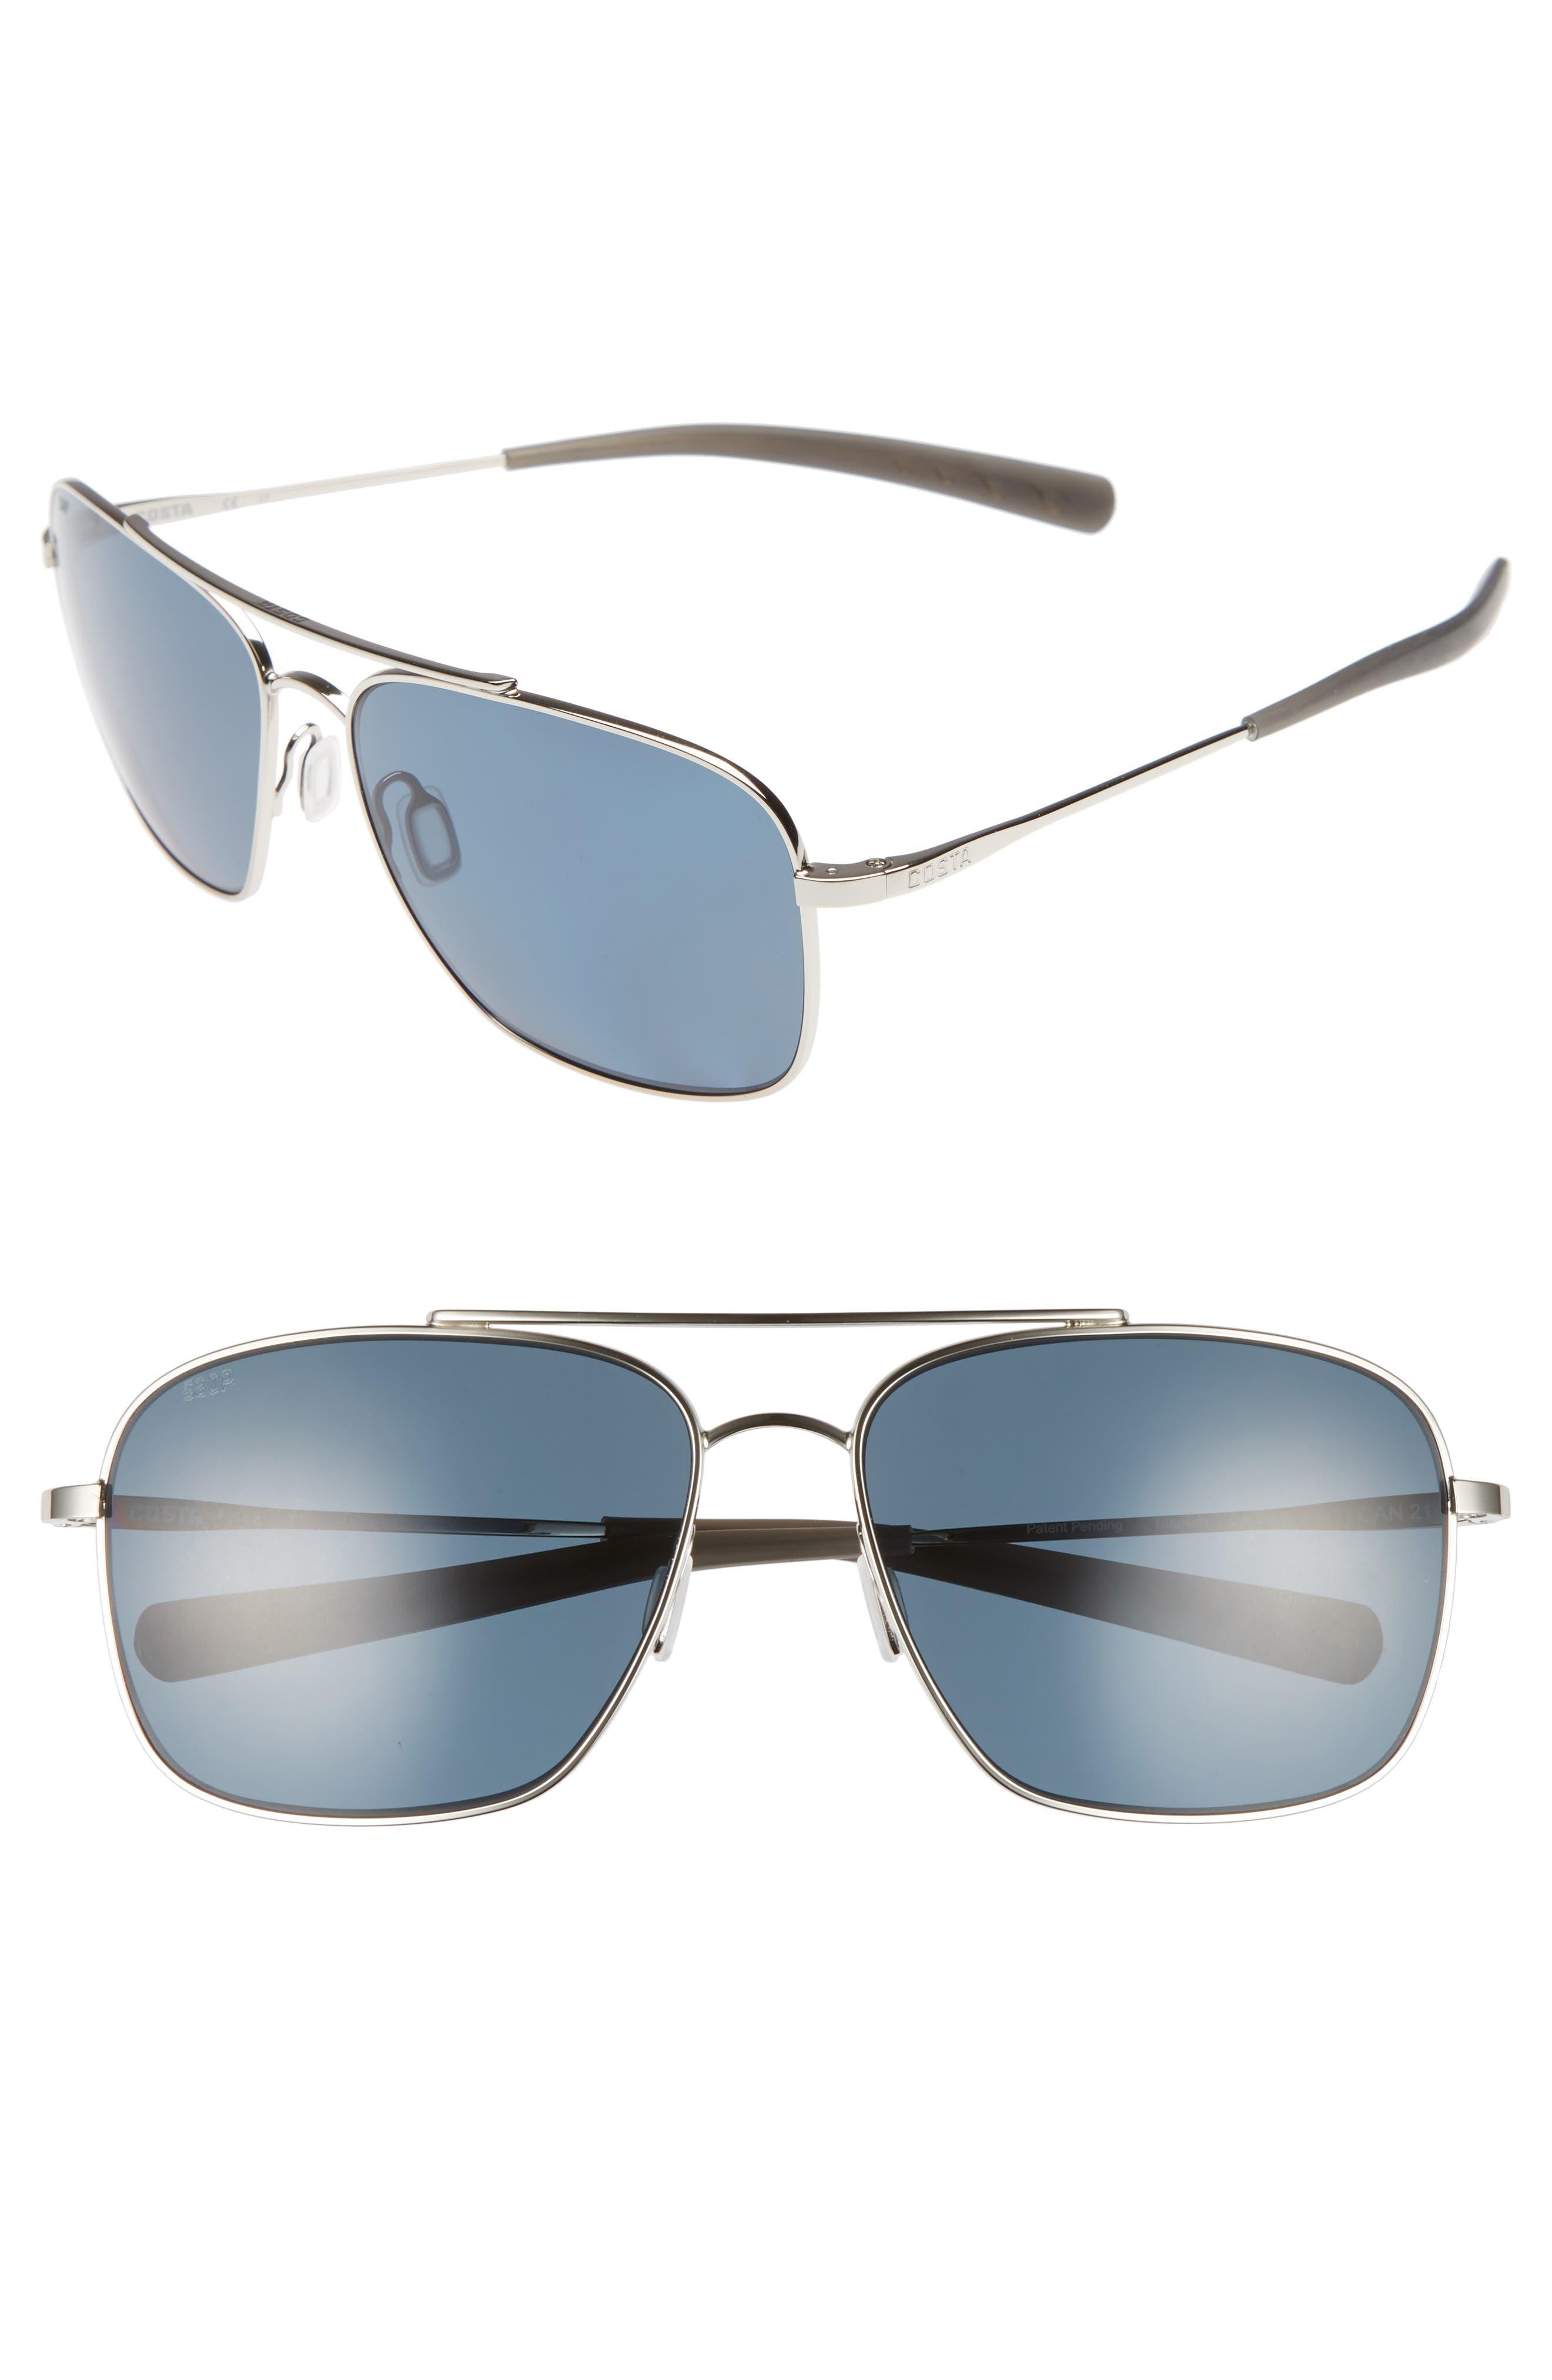 Canaveral 58mm Polarized Sunglasses,                             Main thumbnail 1, color,                             Shiny Palladium/ Grey